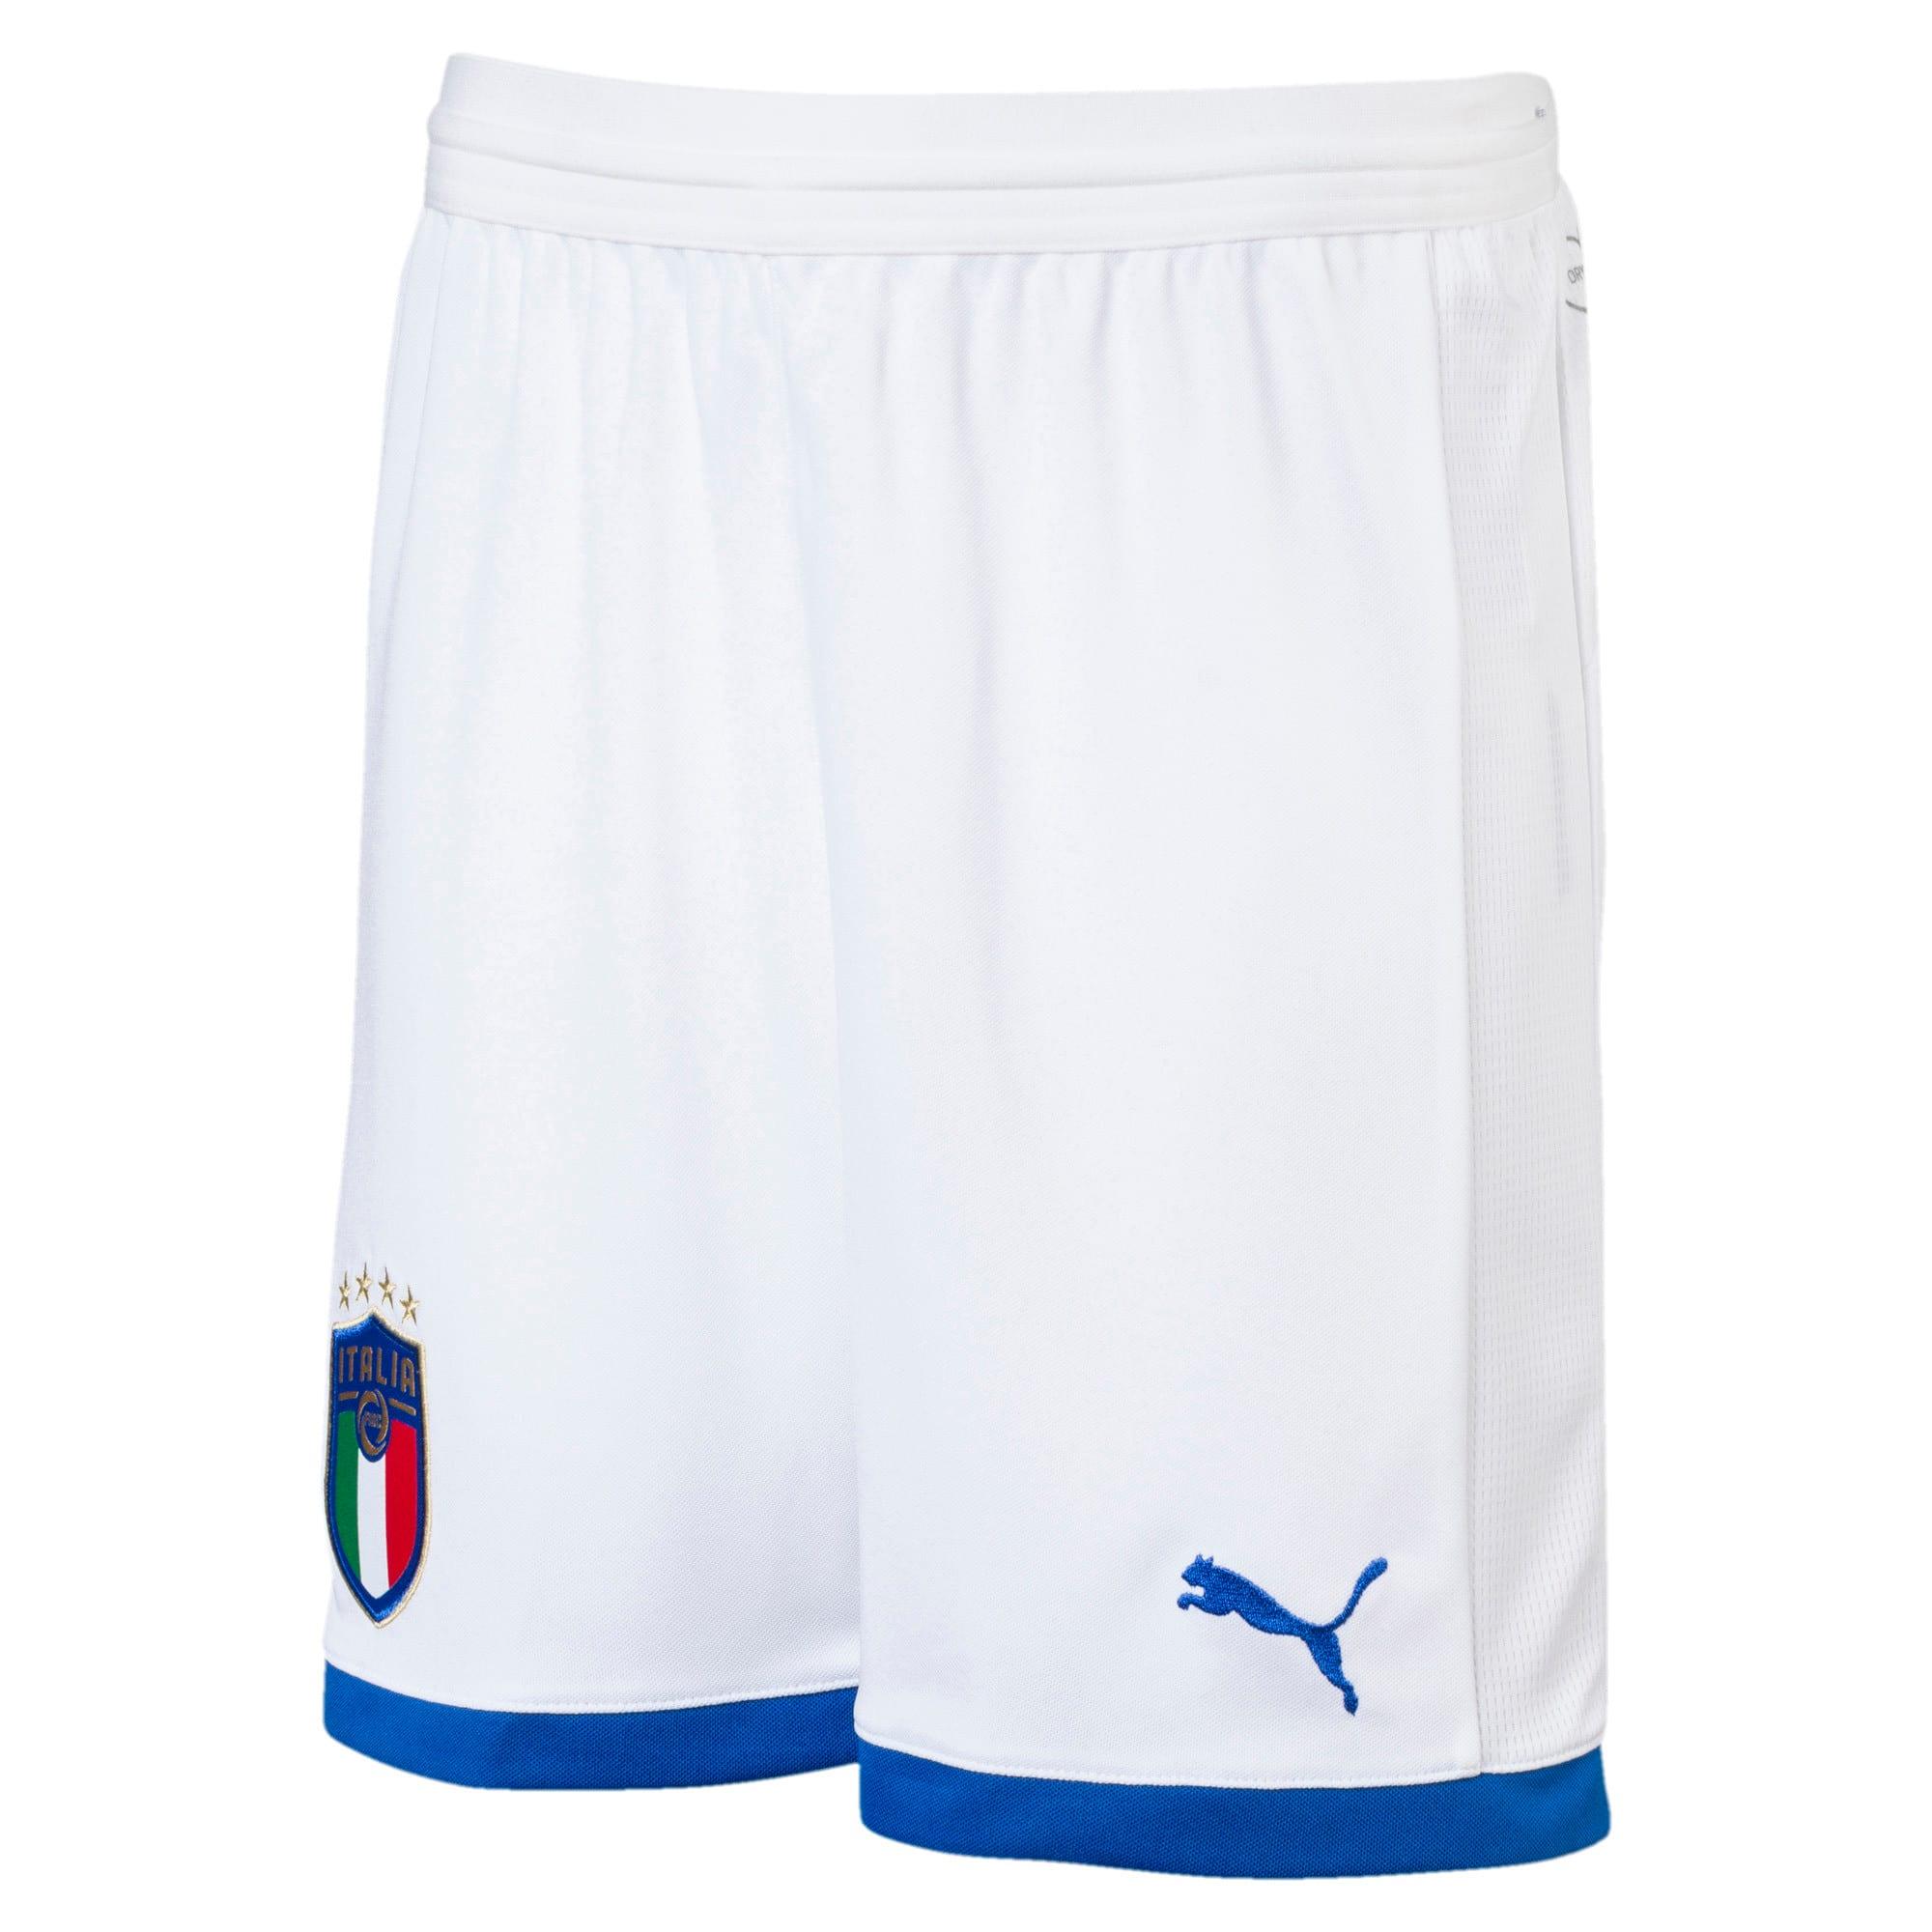 Thumbnail 1 of Italia Kinder Shorts, Puma White-AWAY, medium